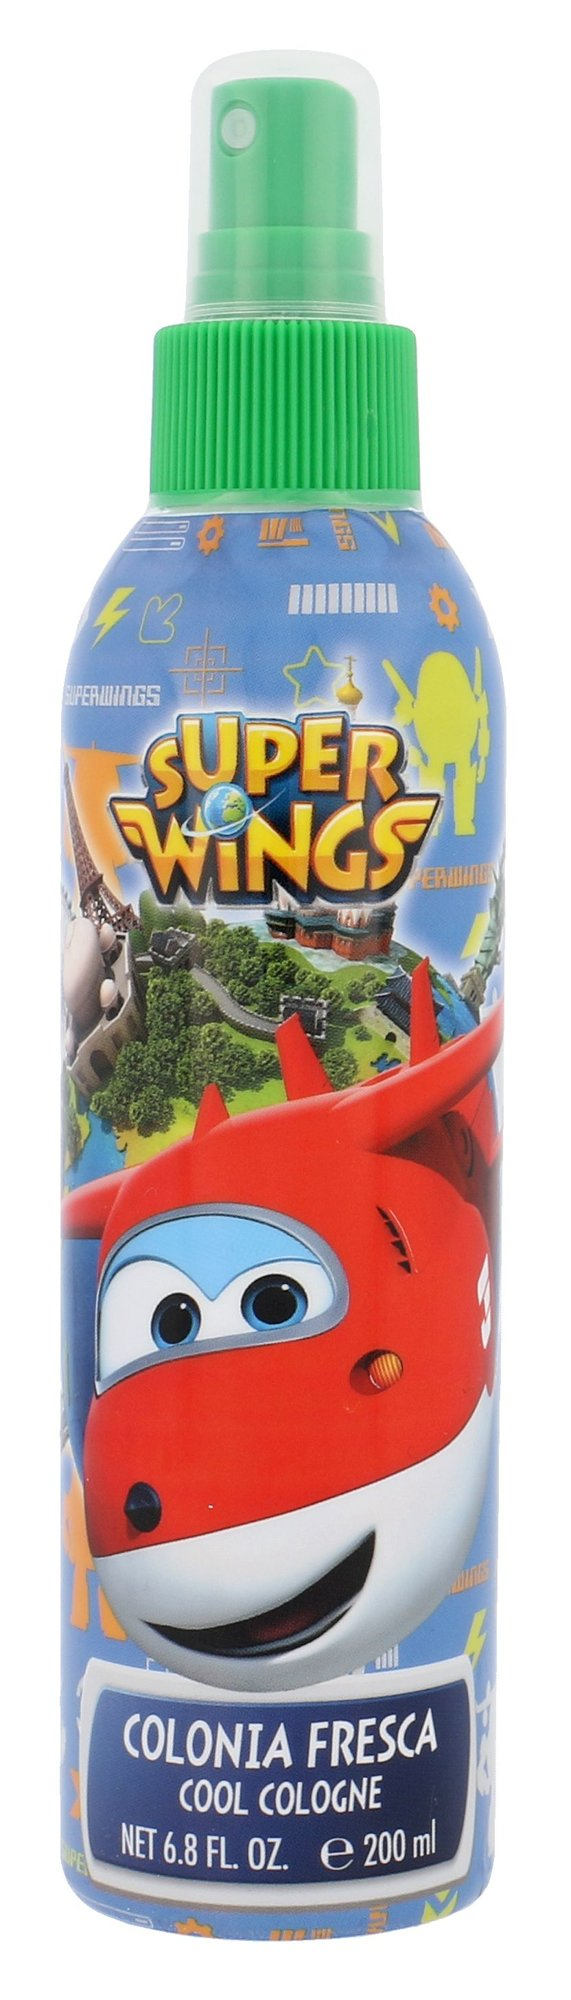 Super Wings Super Wings Tělový spray 200ml